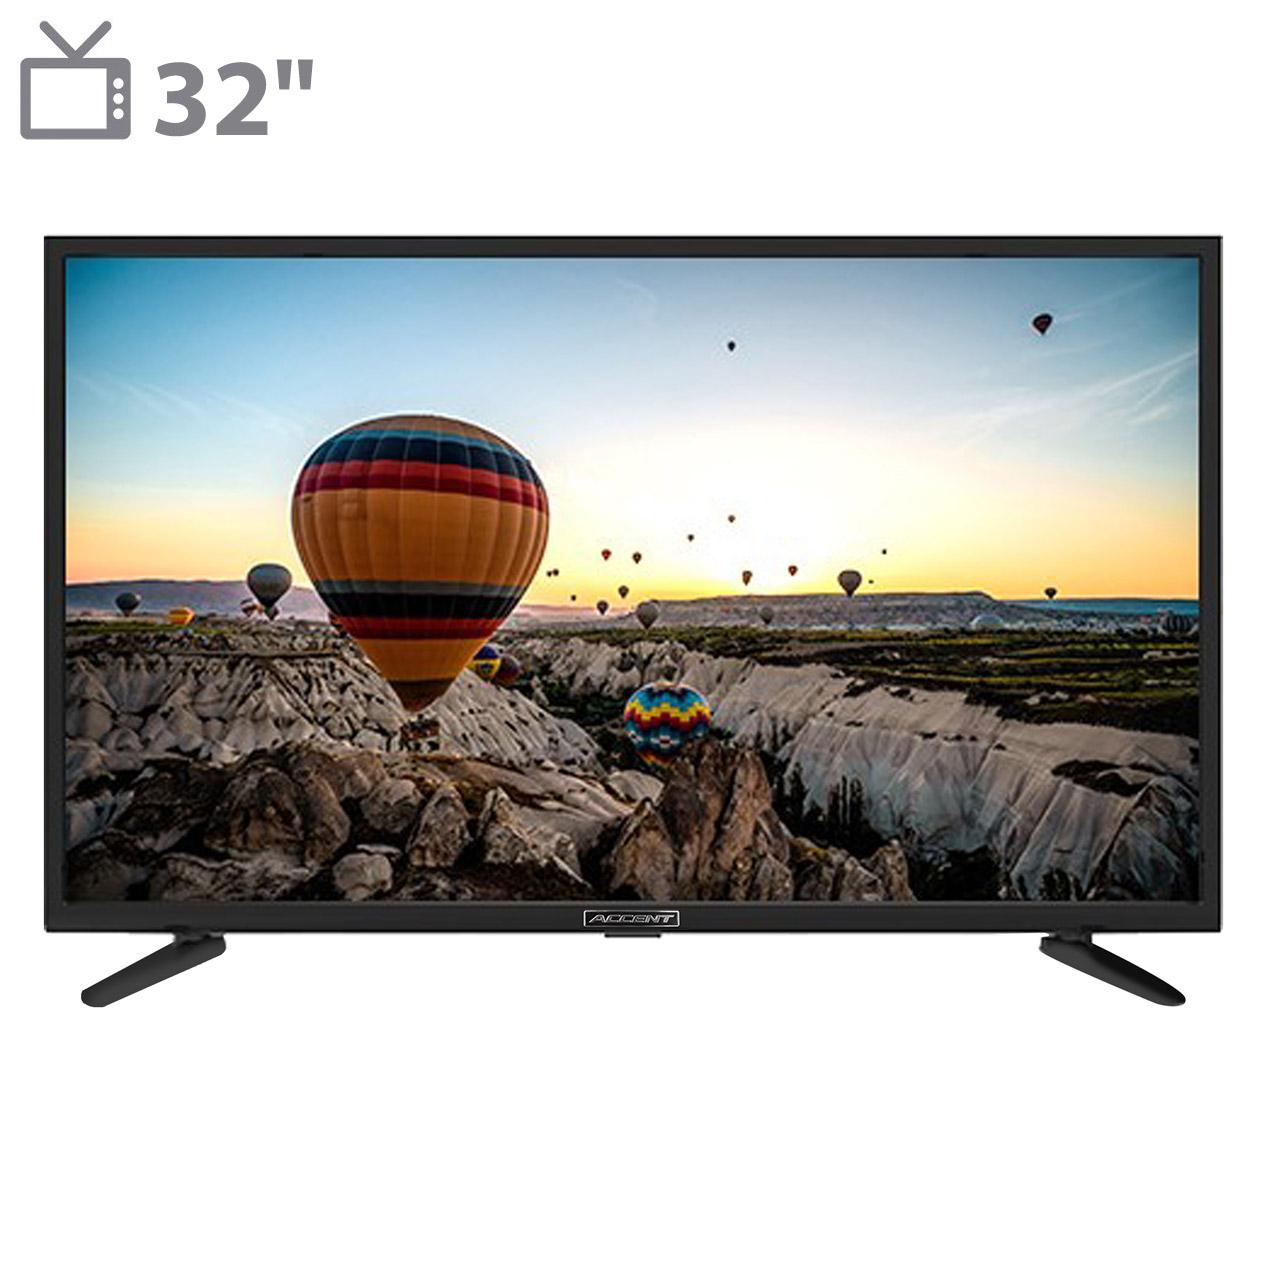 تلویزیون ال ای دی اکسنت مدل ACT3219 سایز ۳۲ اینچ